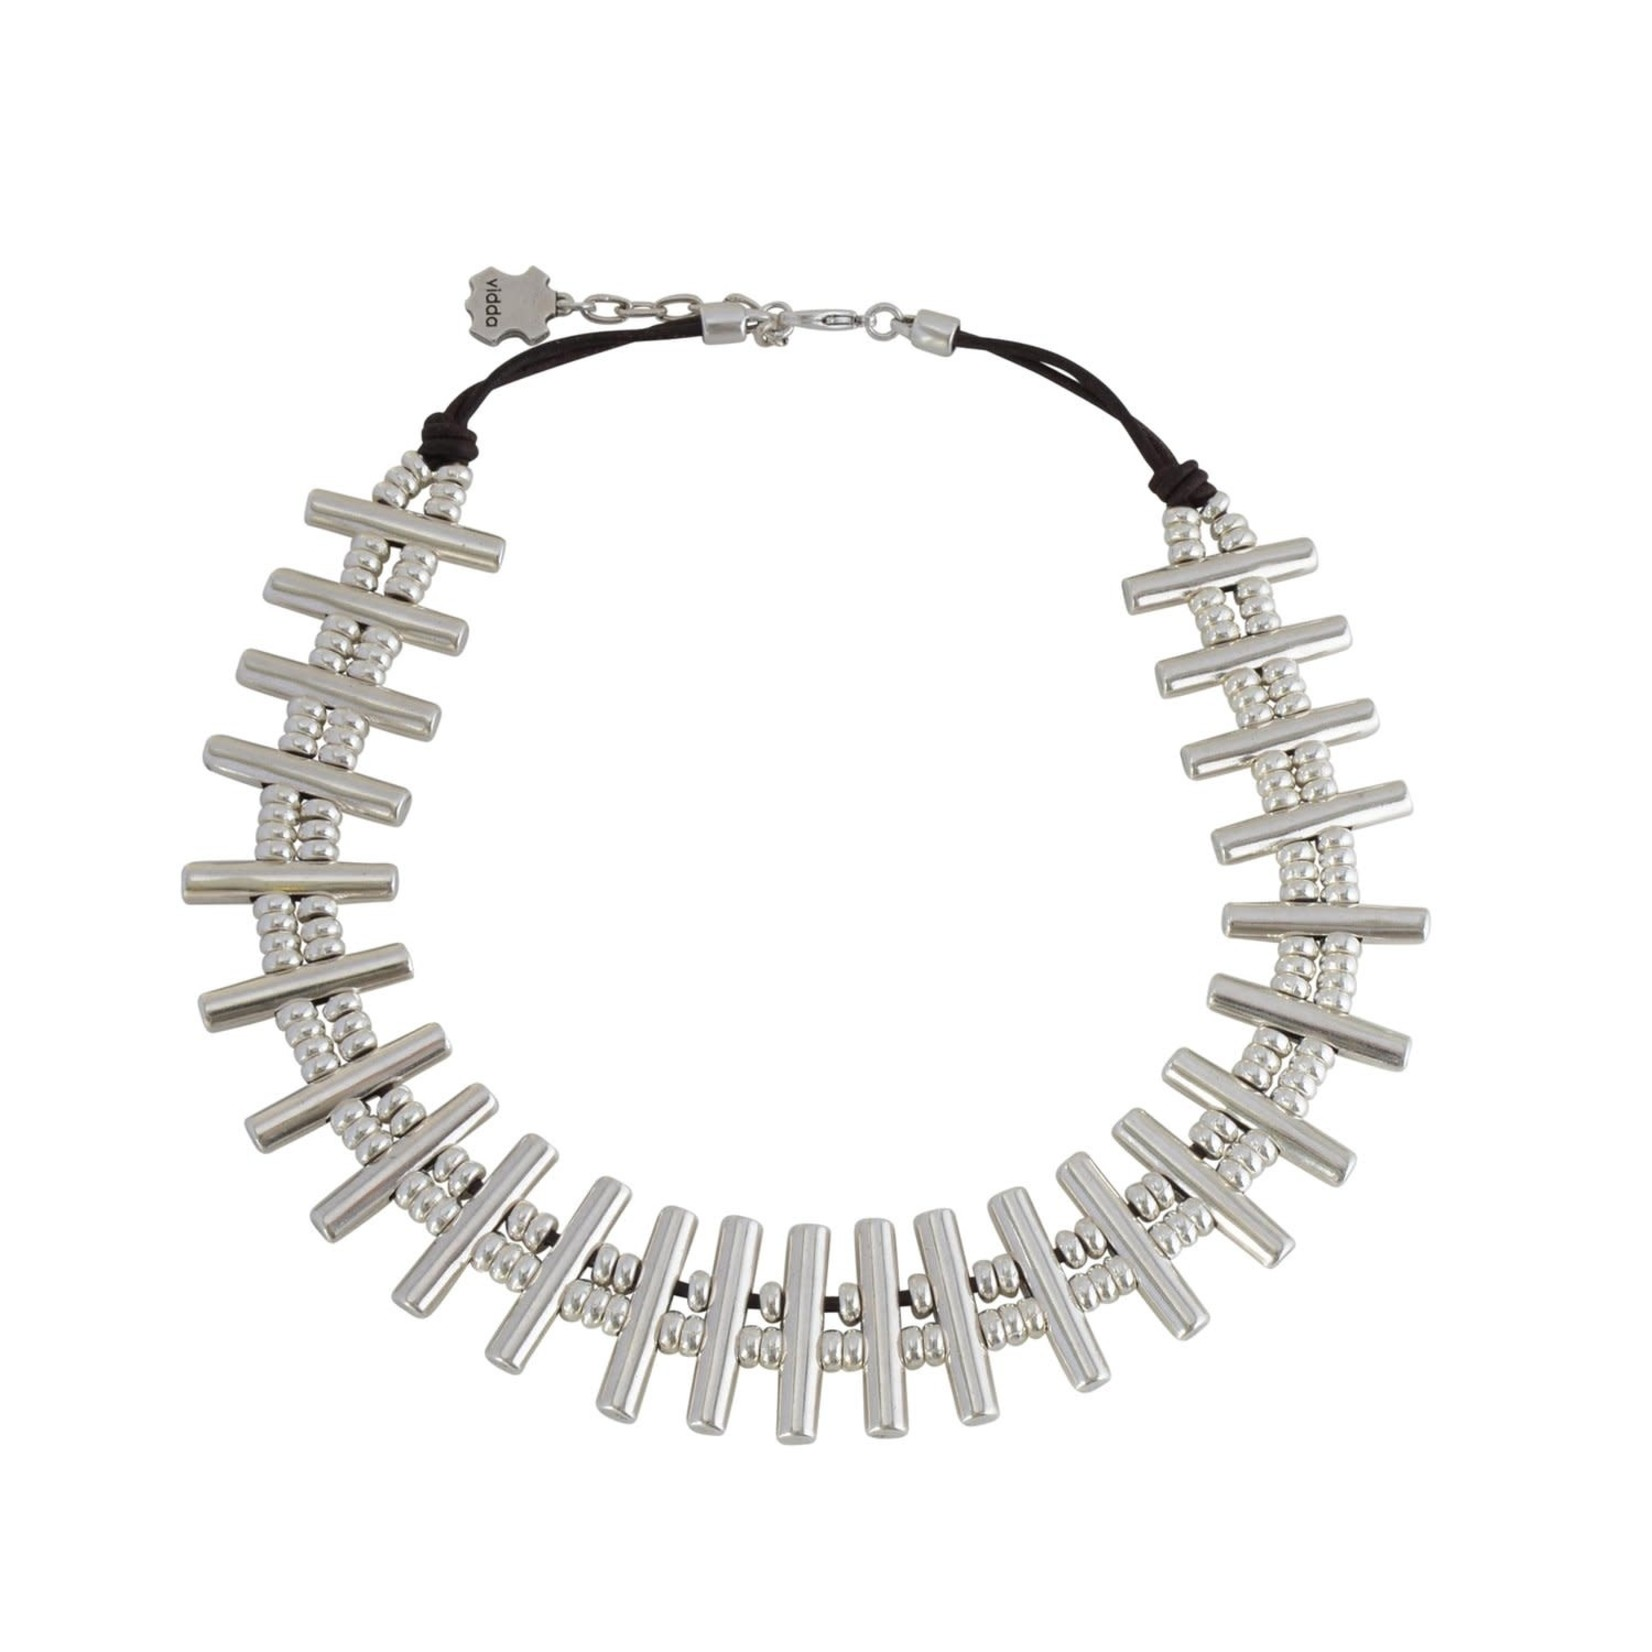 Necklace/Mataram/Silver Bars/Short